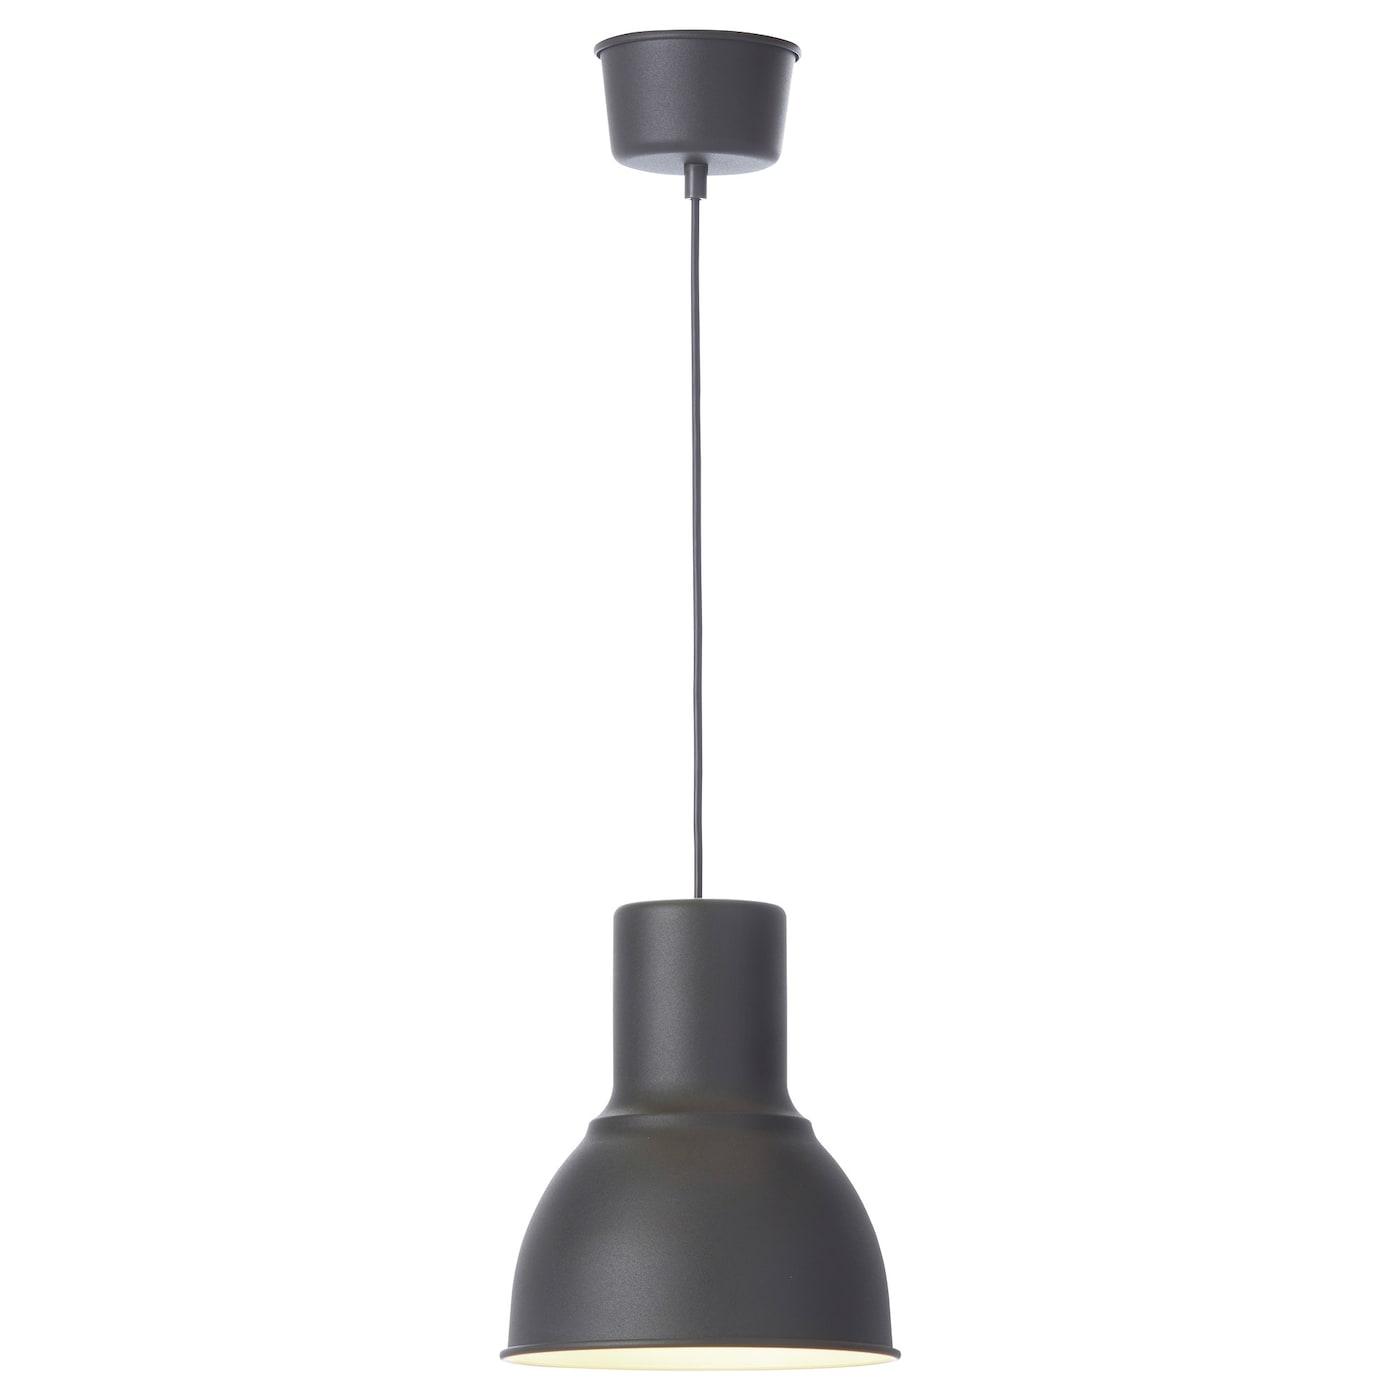 Ikea Light Fixtures Quality: Shop At IKEA Ireland